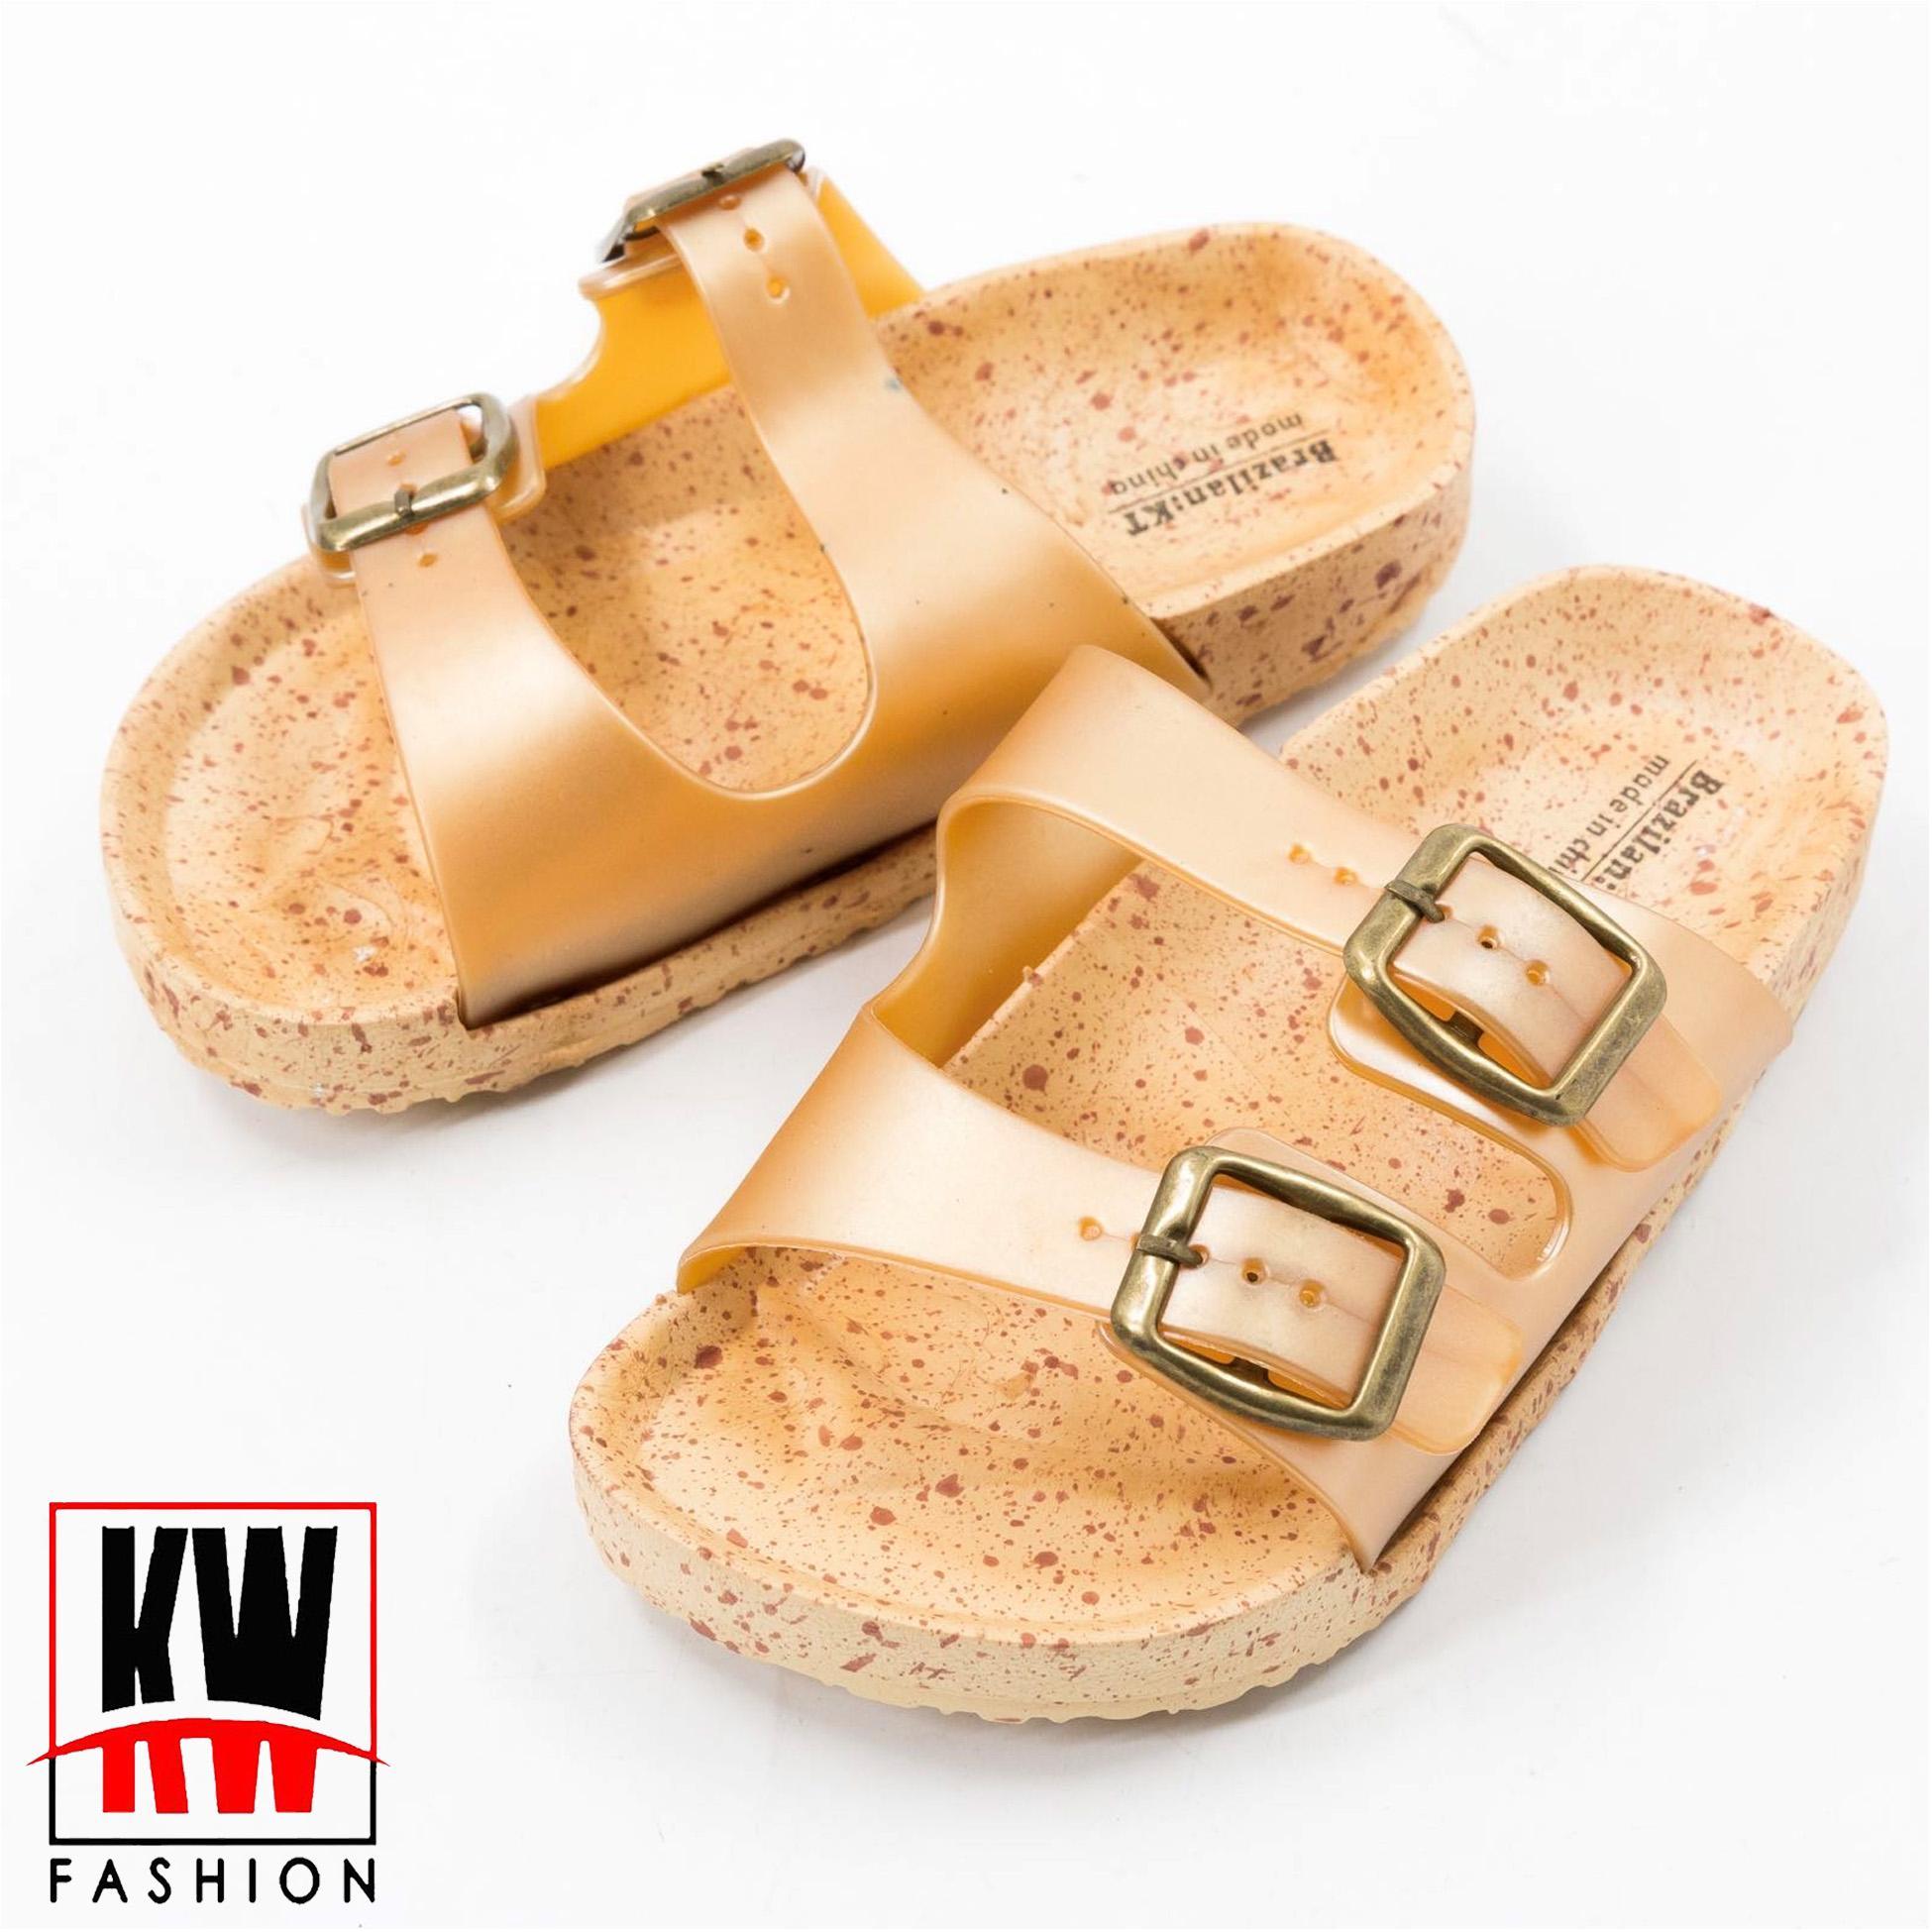 b0c28603ce8 Womens Sandals for sale - Ladies Sandals online brands